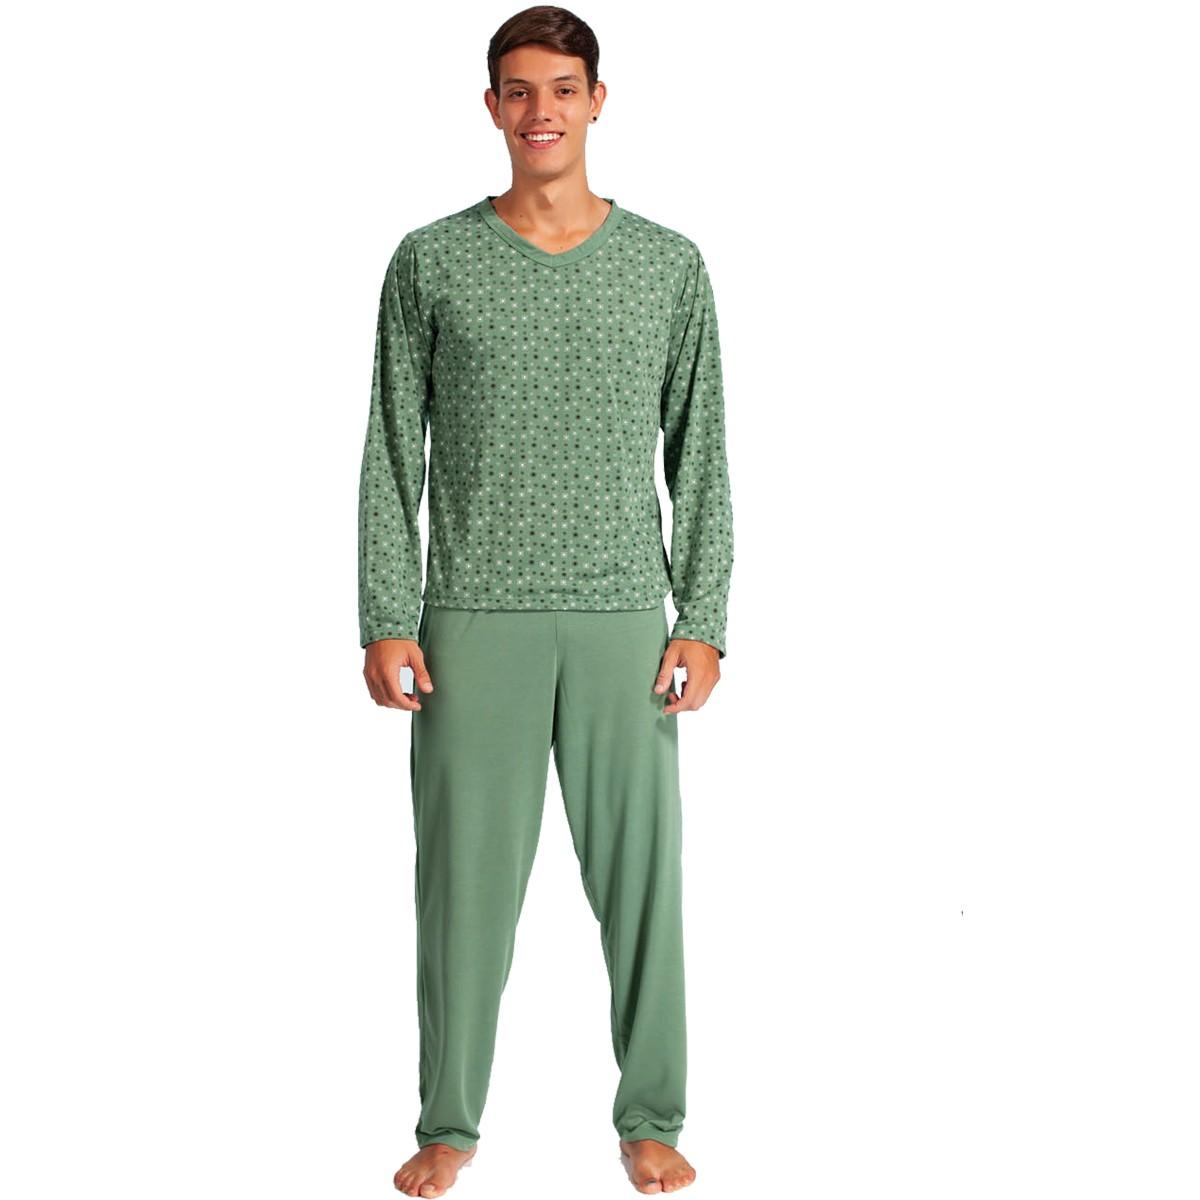 Pijama Longo Manga Longa Com Calça Masculino Adulto Estampado Ref: 1350